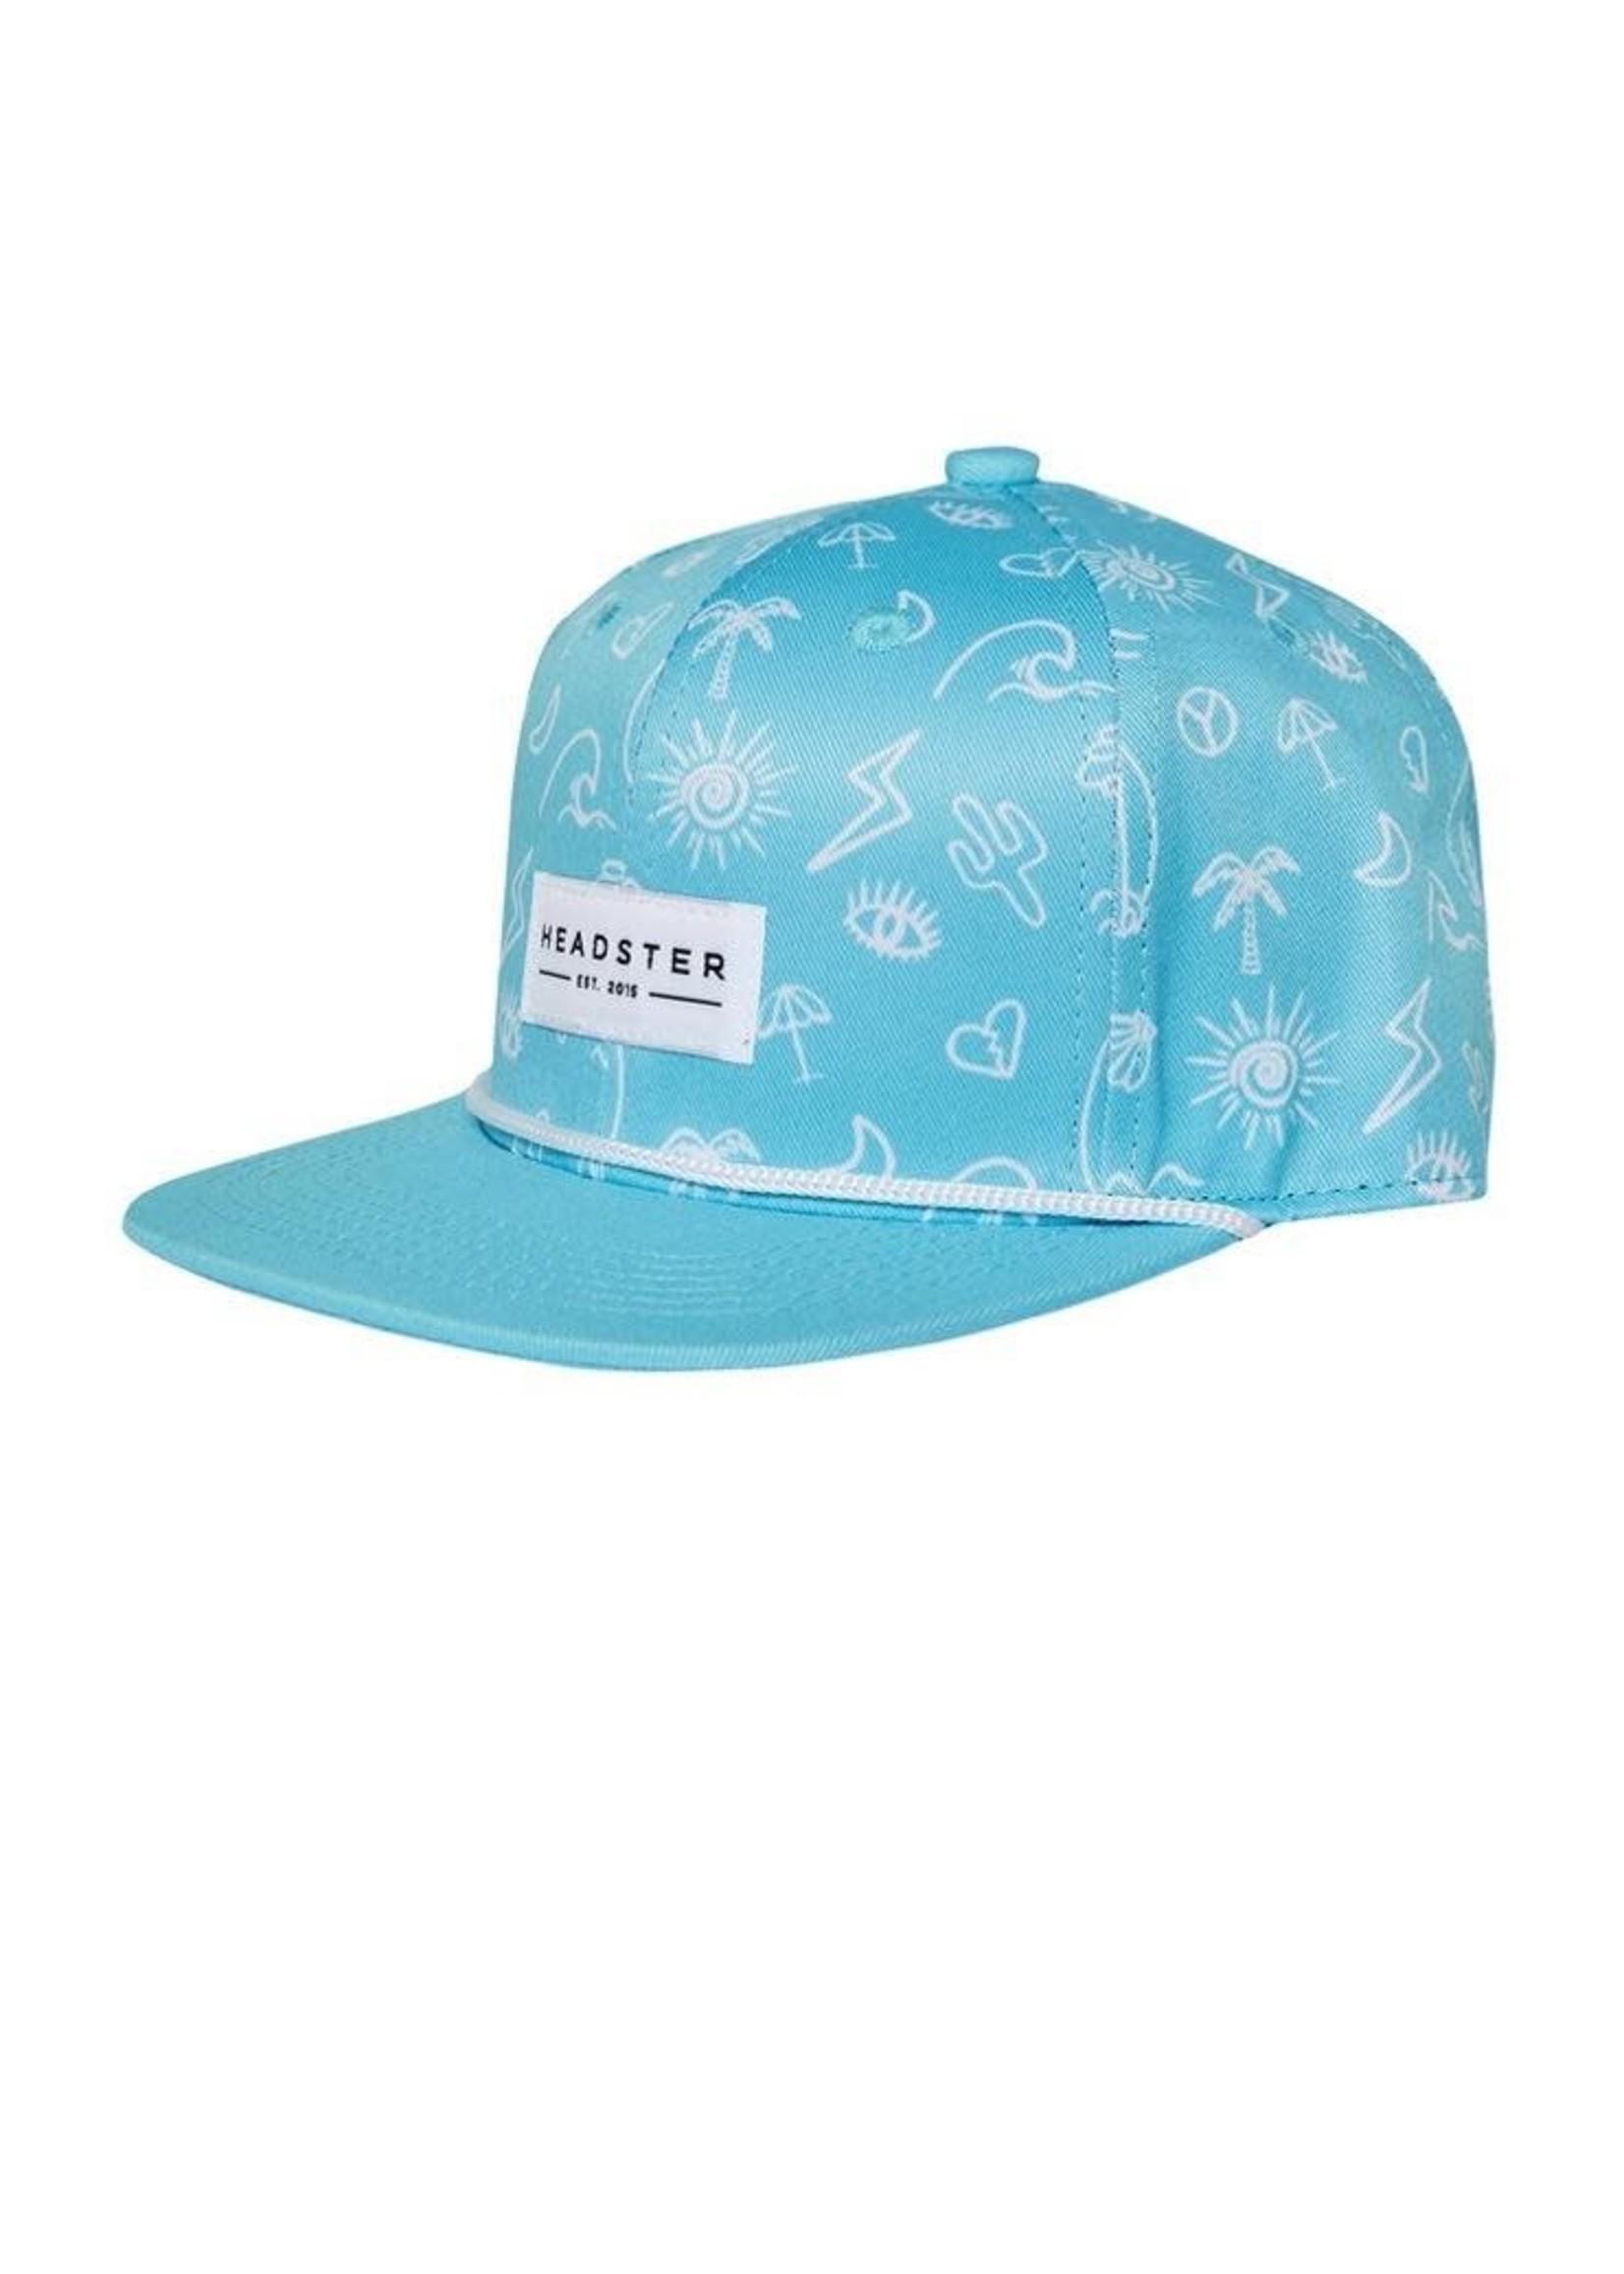 Headster Kids Headster Kids, Surf's Up Turquoise Adjustable Hat